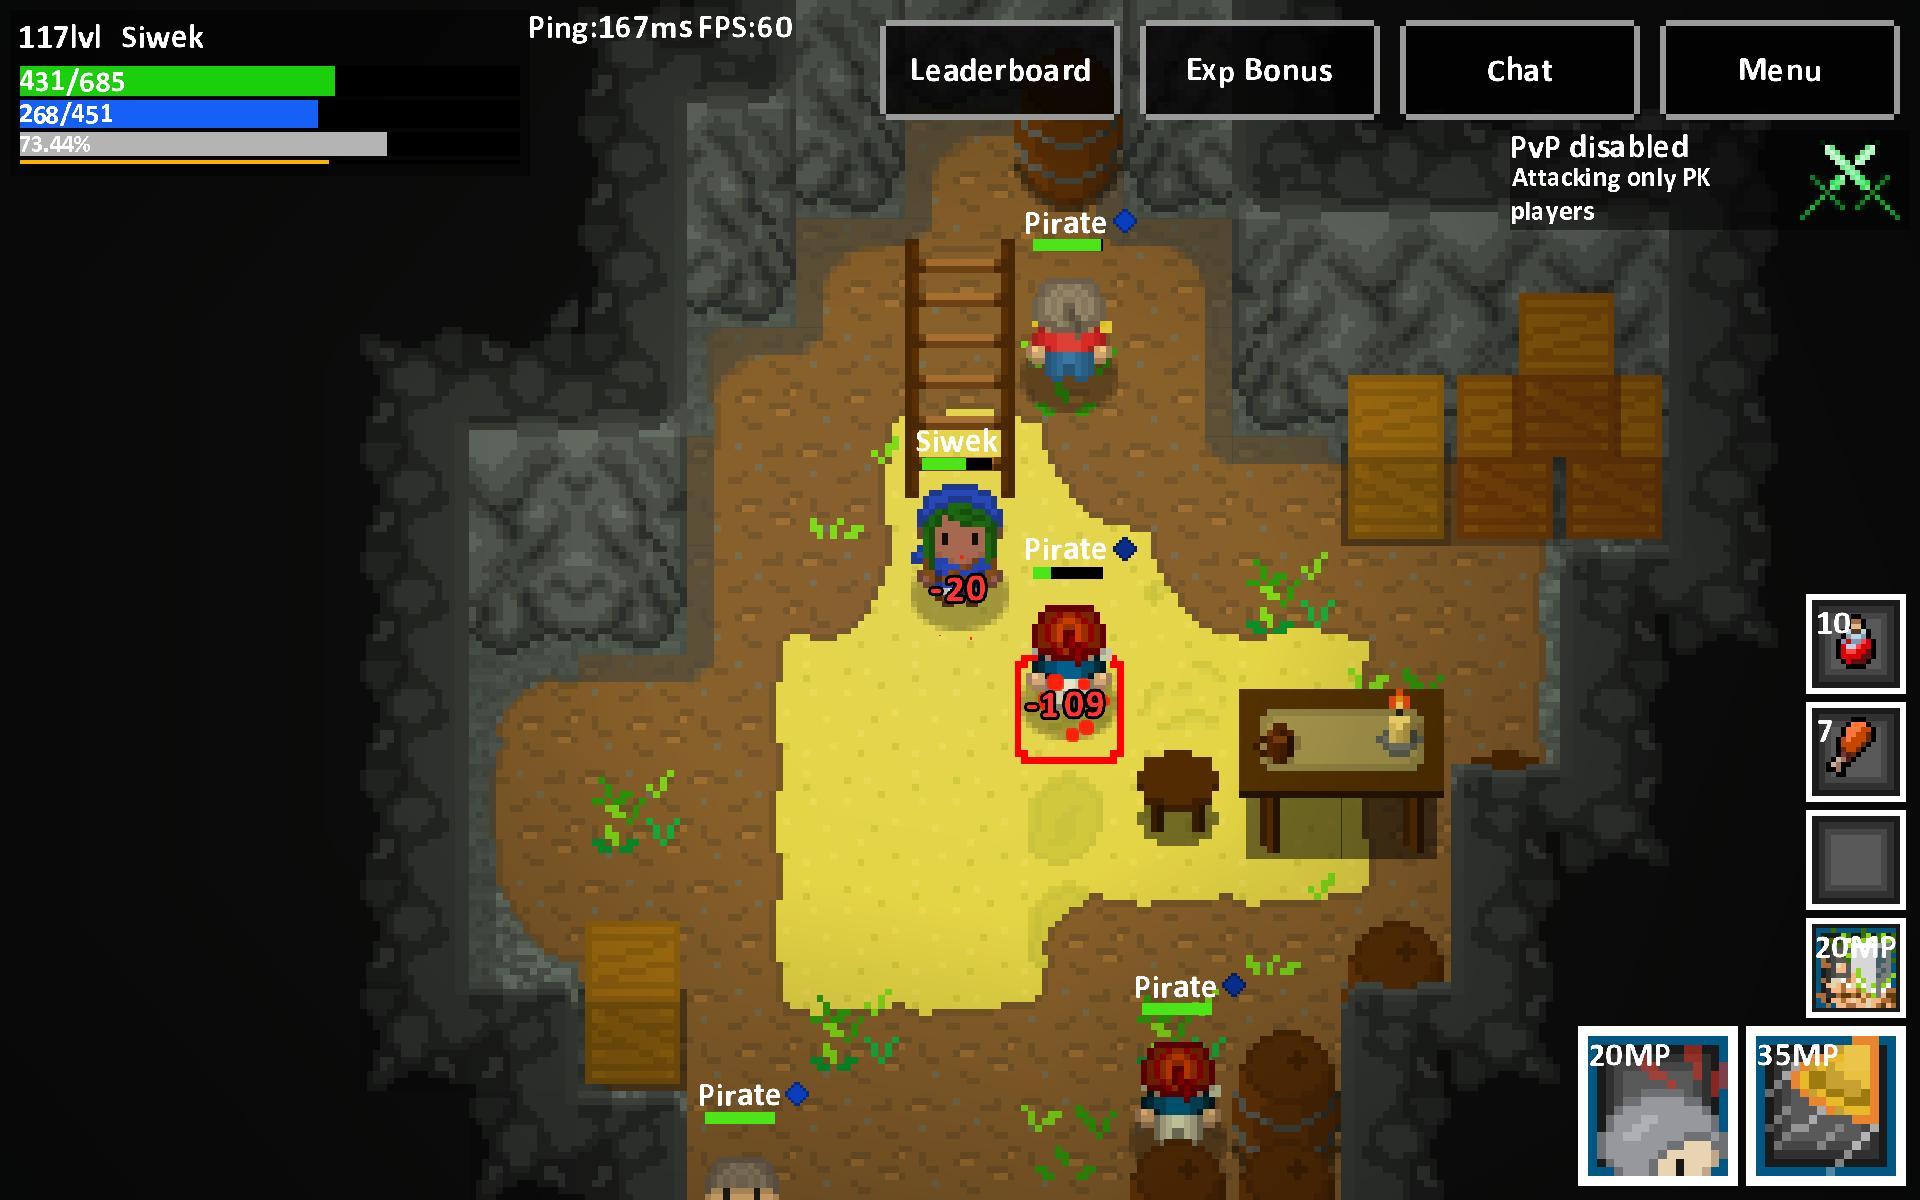 Heroes & Rats MMORPG Online 0.32.2 Screenshot 18